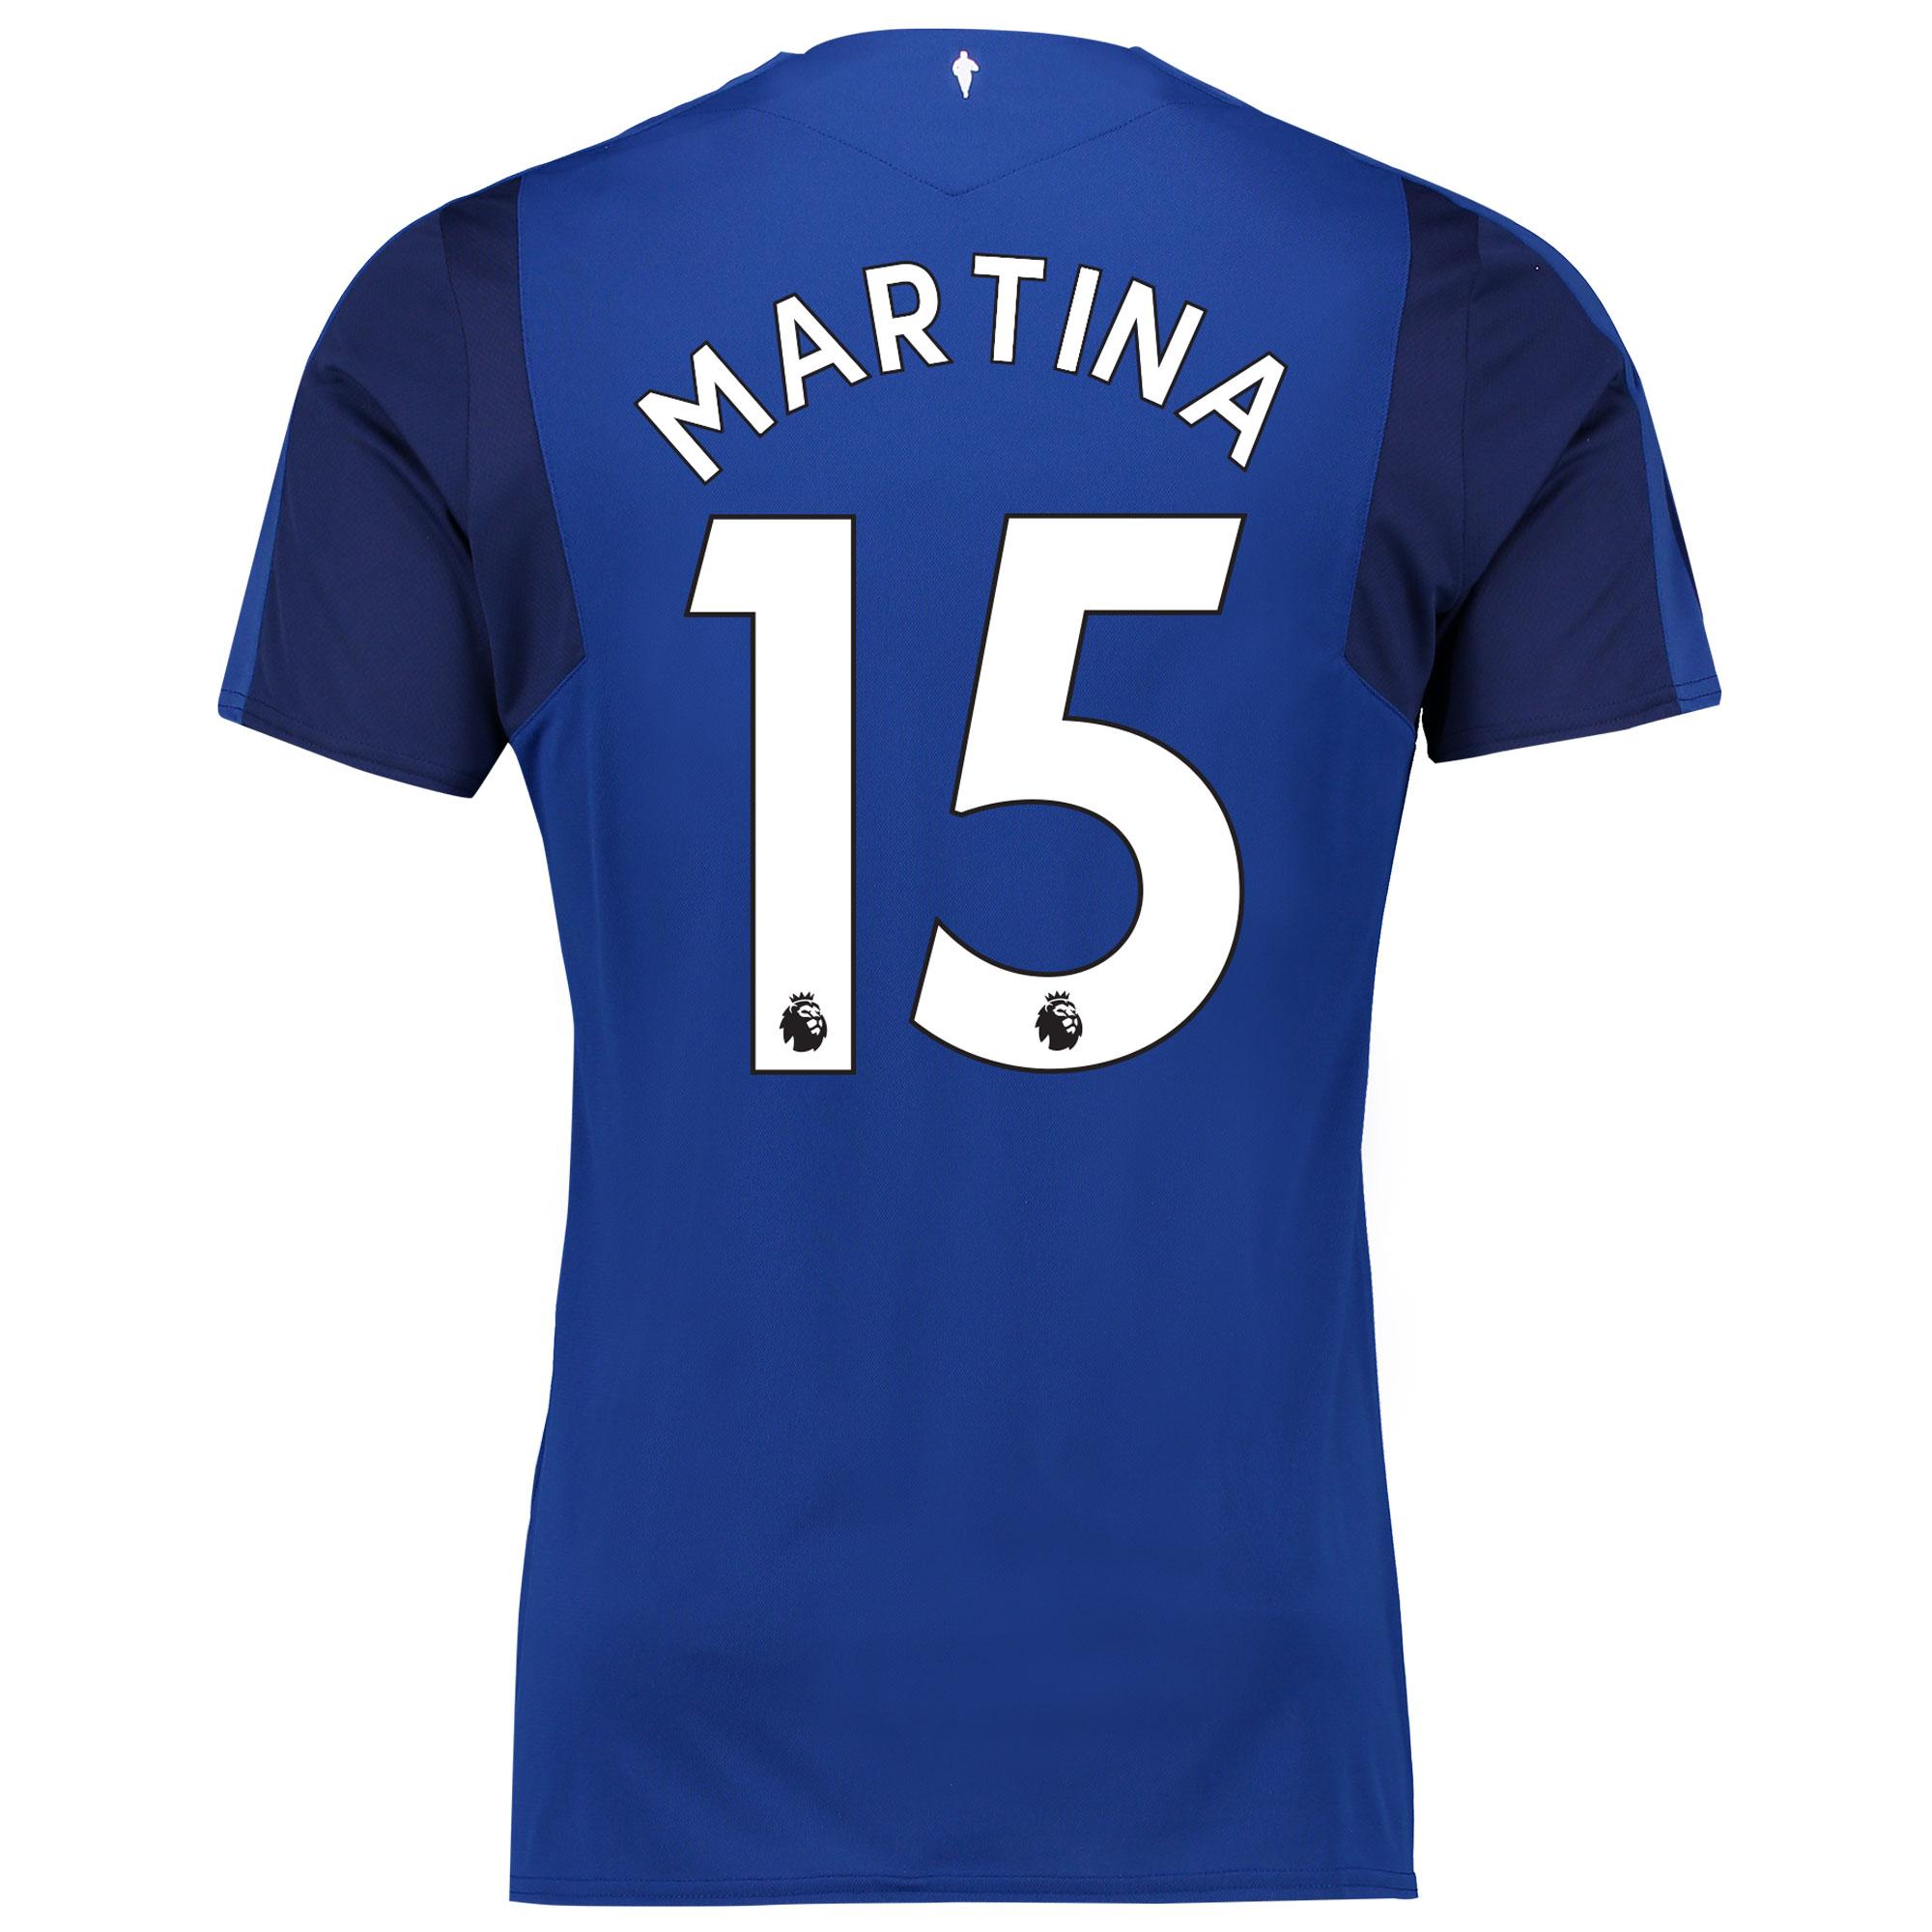 Everton Home Shirt 2017/18 with Martina 15 printing